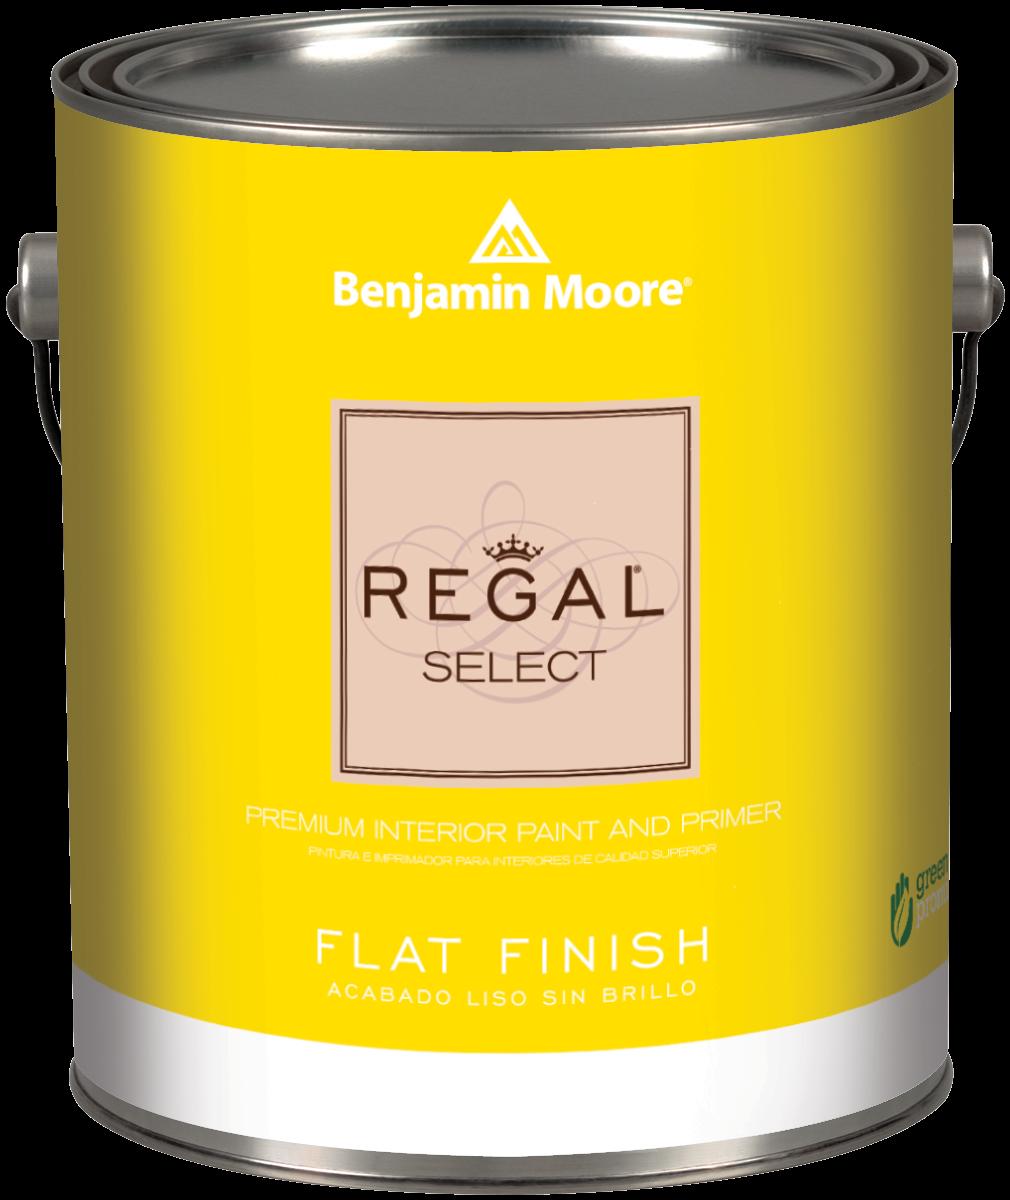 Benjamin moore regal select flat paint grosse ile for Is benjamin moore paint good